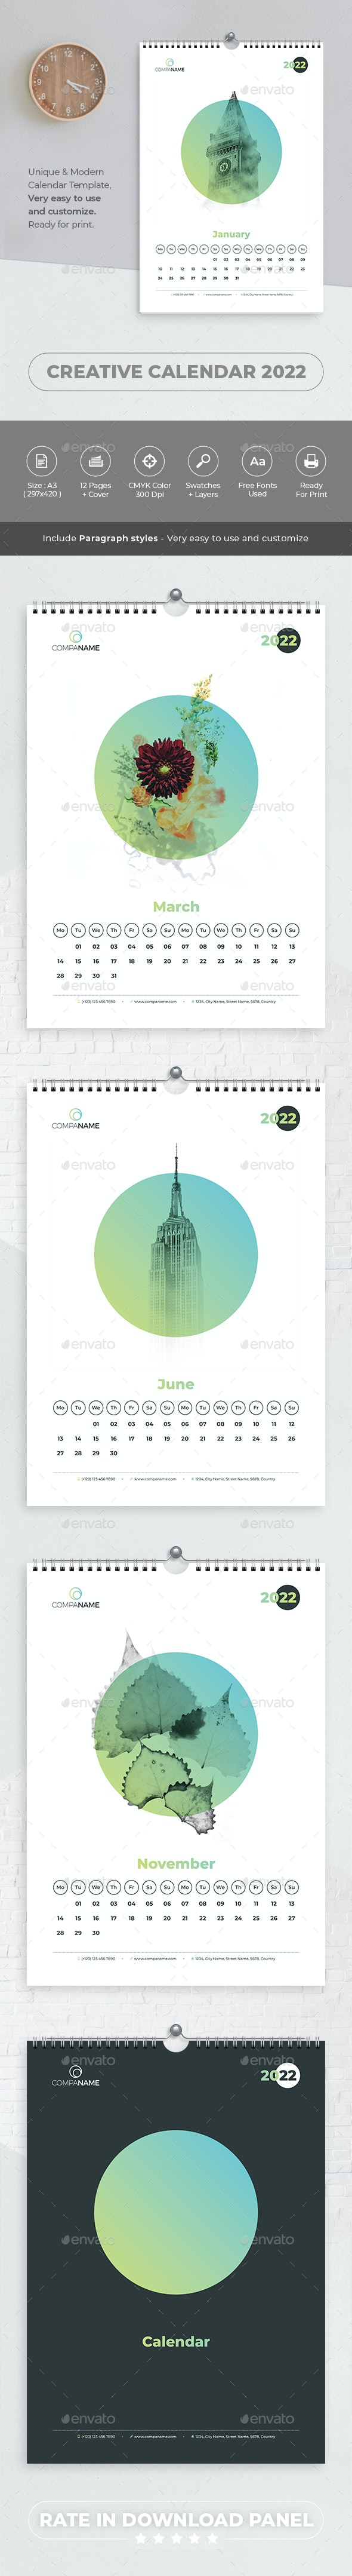 Creative Calendar 2022 - Calendars Stationery